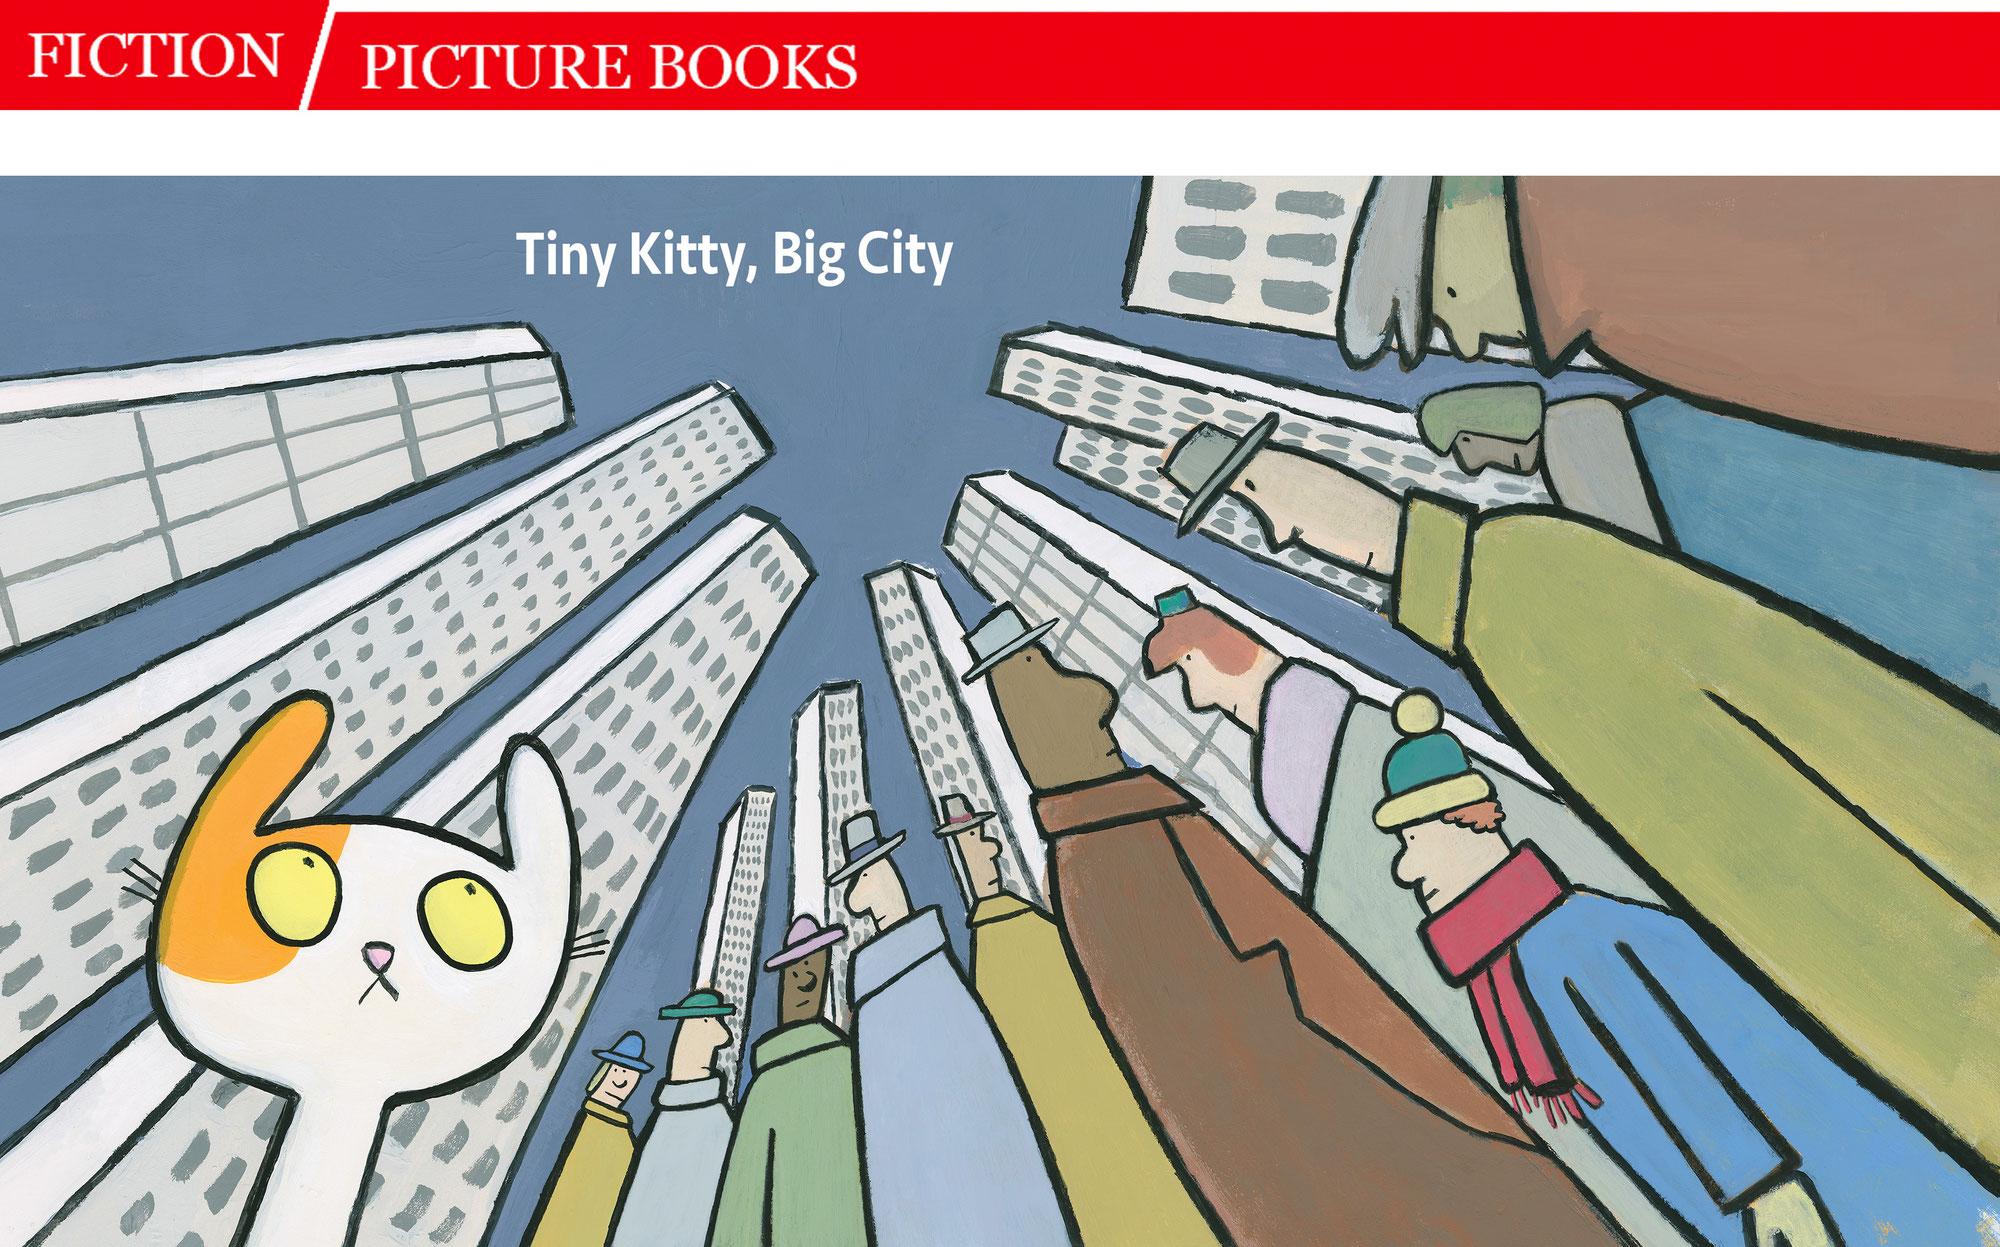 Tiny Kitty, Big City SLJ Review